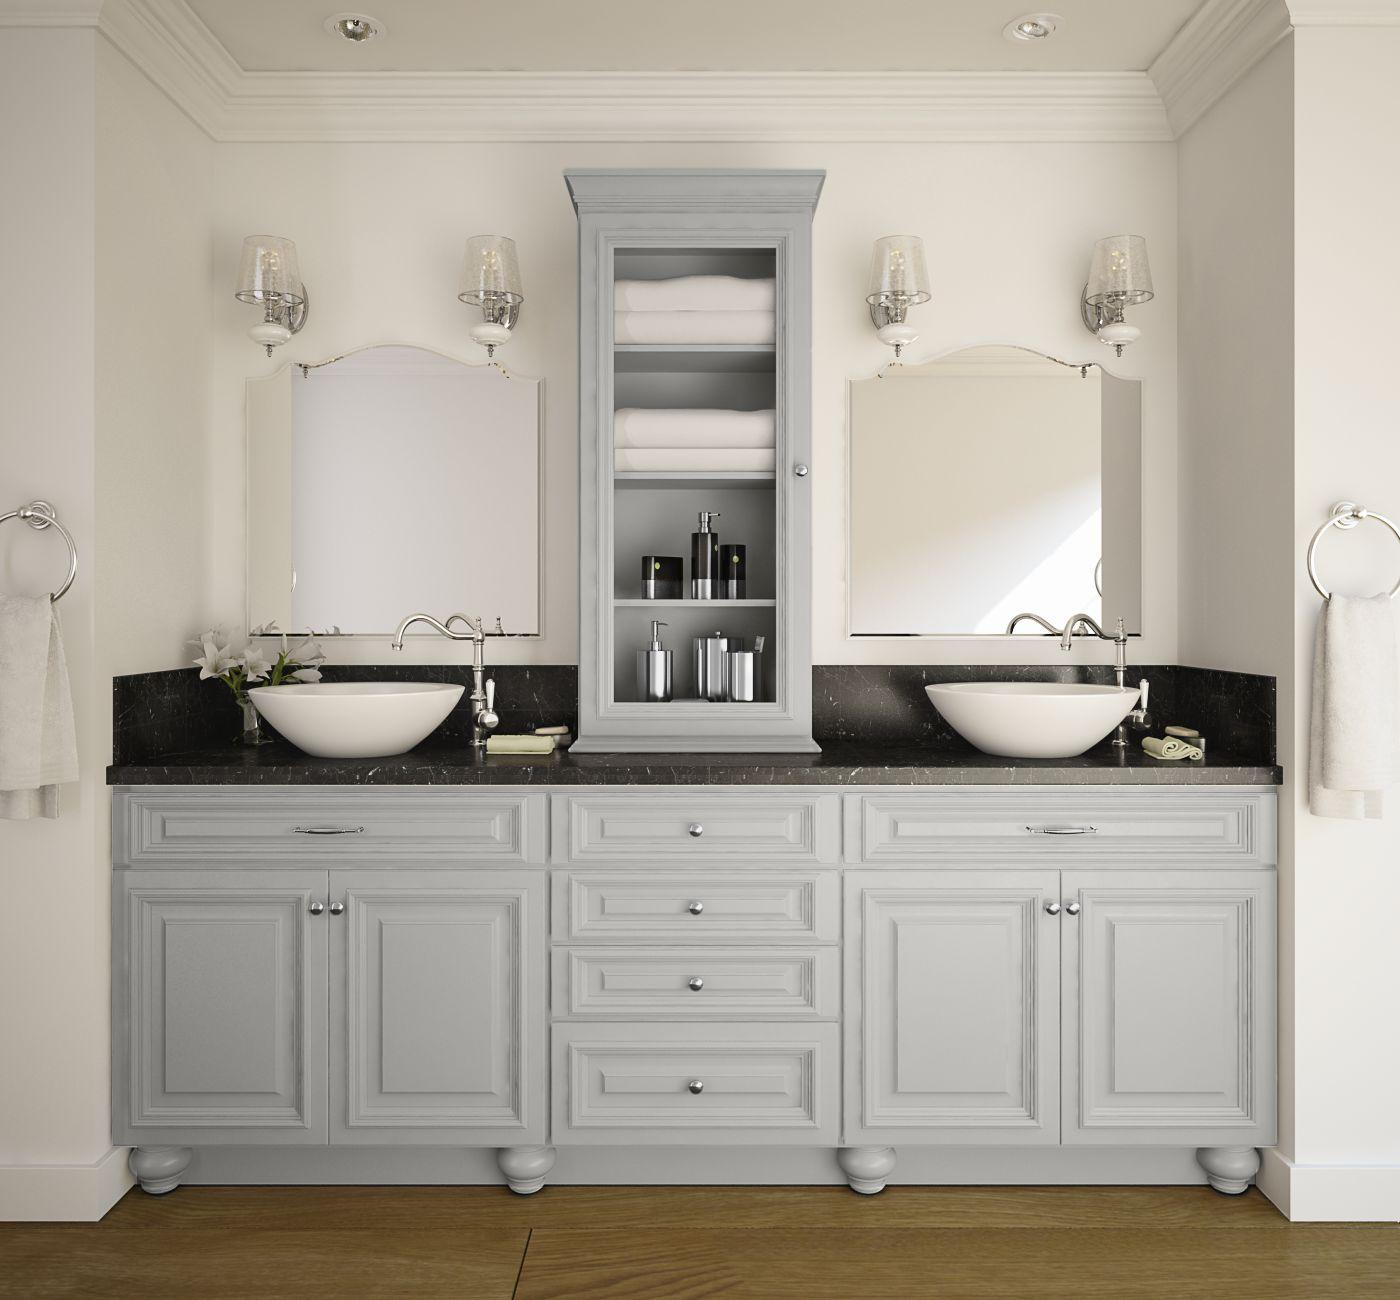 Preassembled Kitchen Cabinets: Roosevelt Dove Gray Pre-Assembled Kitchen Cabinets